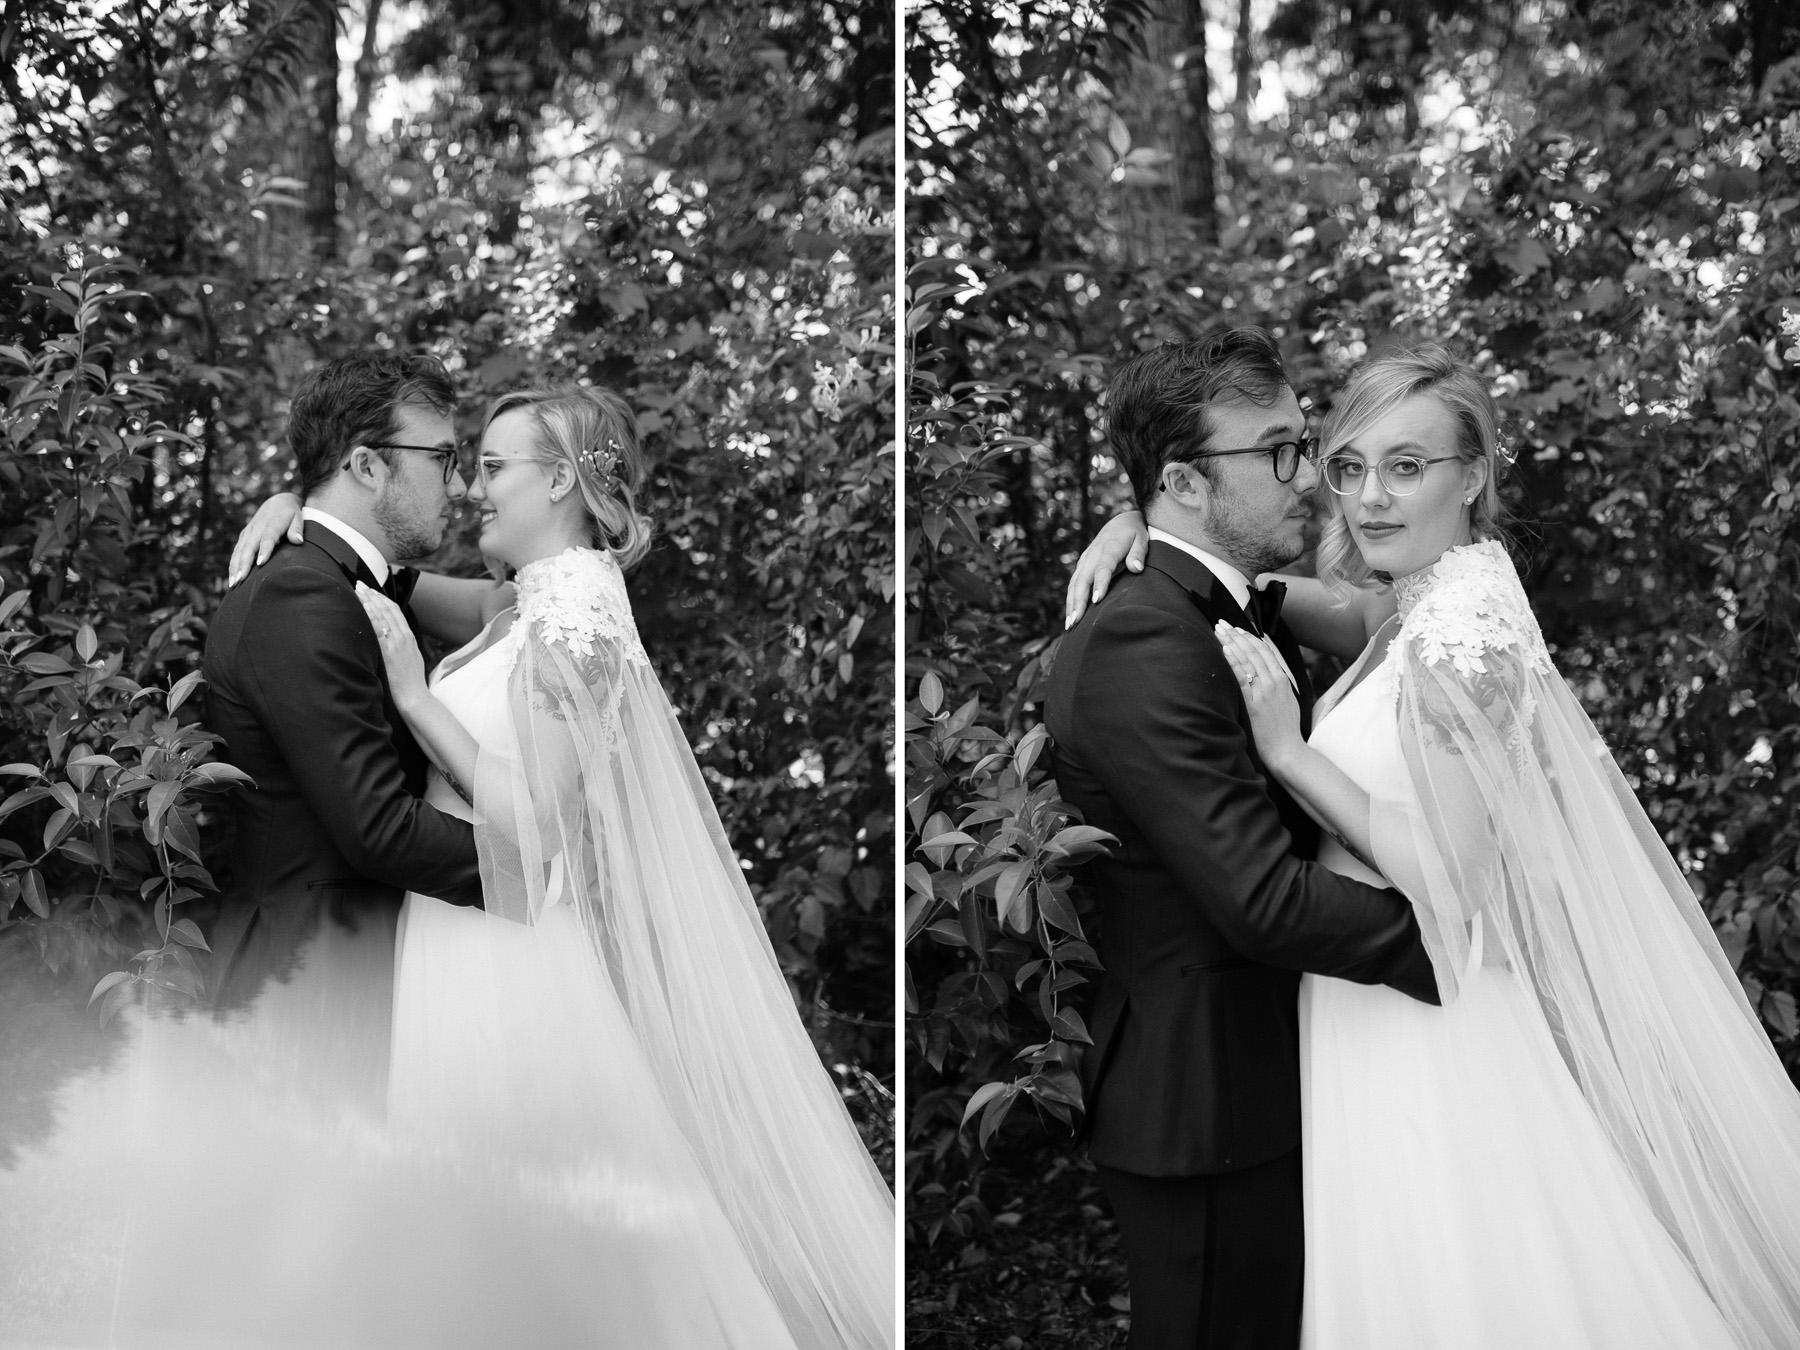 enowen-wedding-photography-mike-anna-suffolk-punch-charlotte (34 of 78).jpg